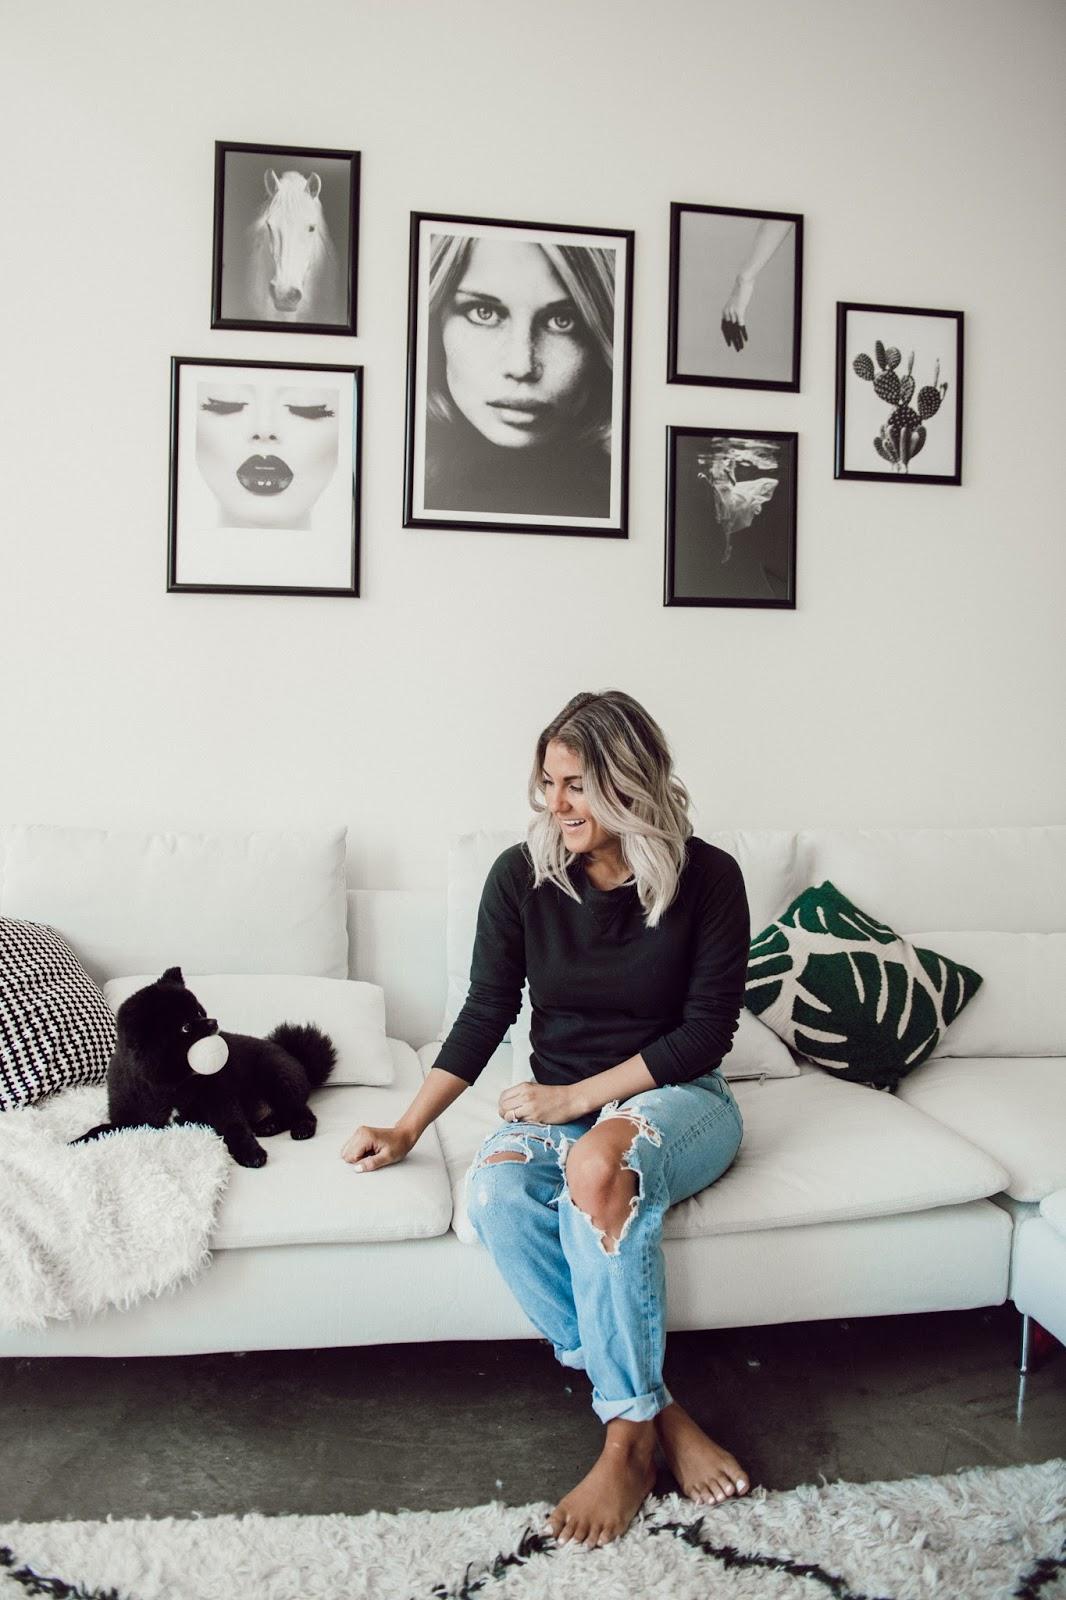 Modern Scandinavian Home Inspo - @taylorwinkelmeyer